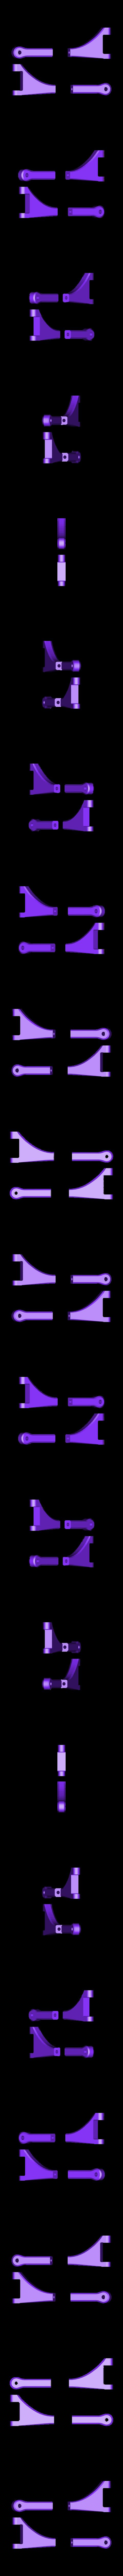 Armrear03.stl Download free STL file Lynx - Fully 3D-printable 1/10 4wd buggy • Object to 3D print, tahustvedt